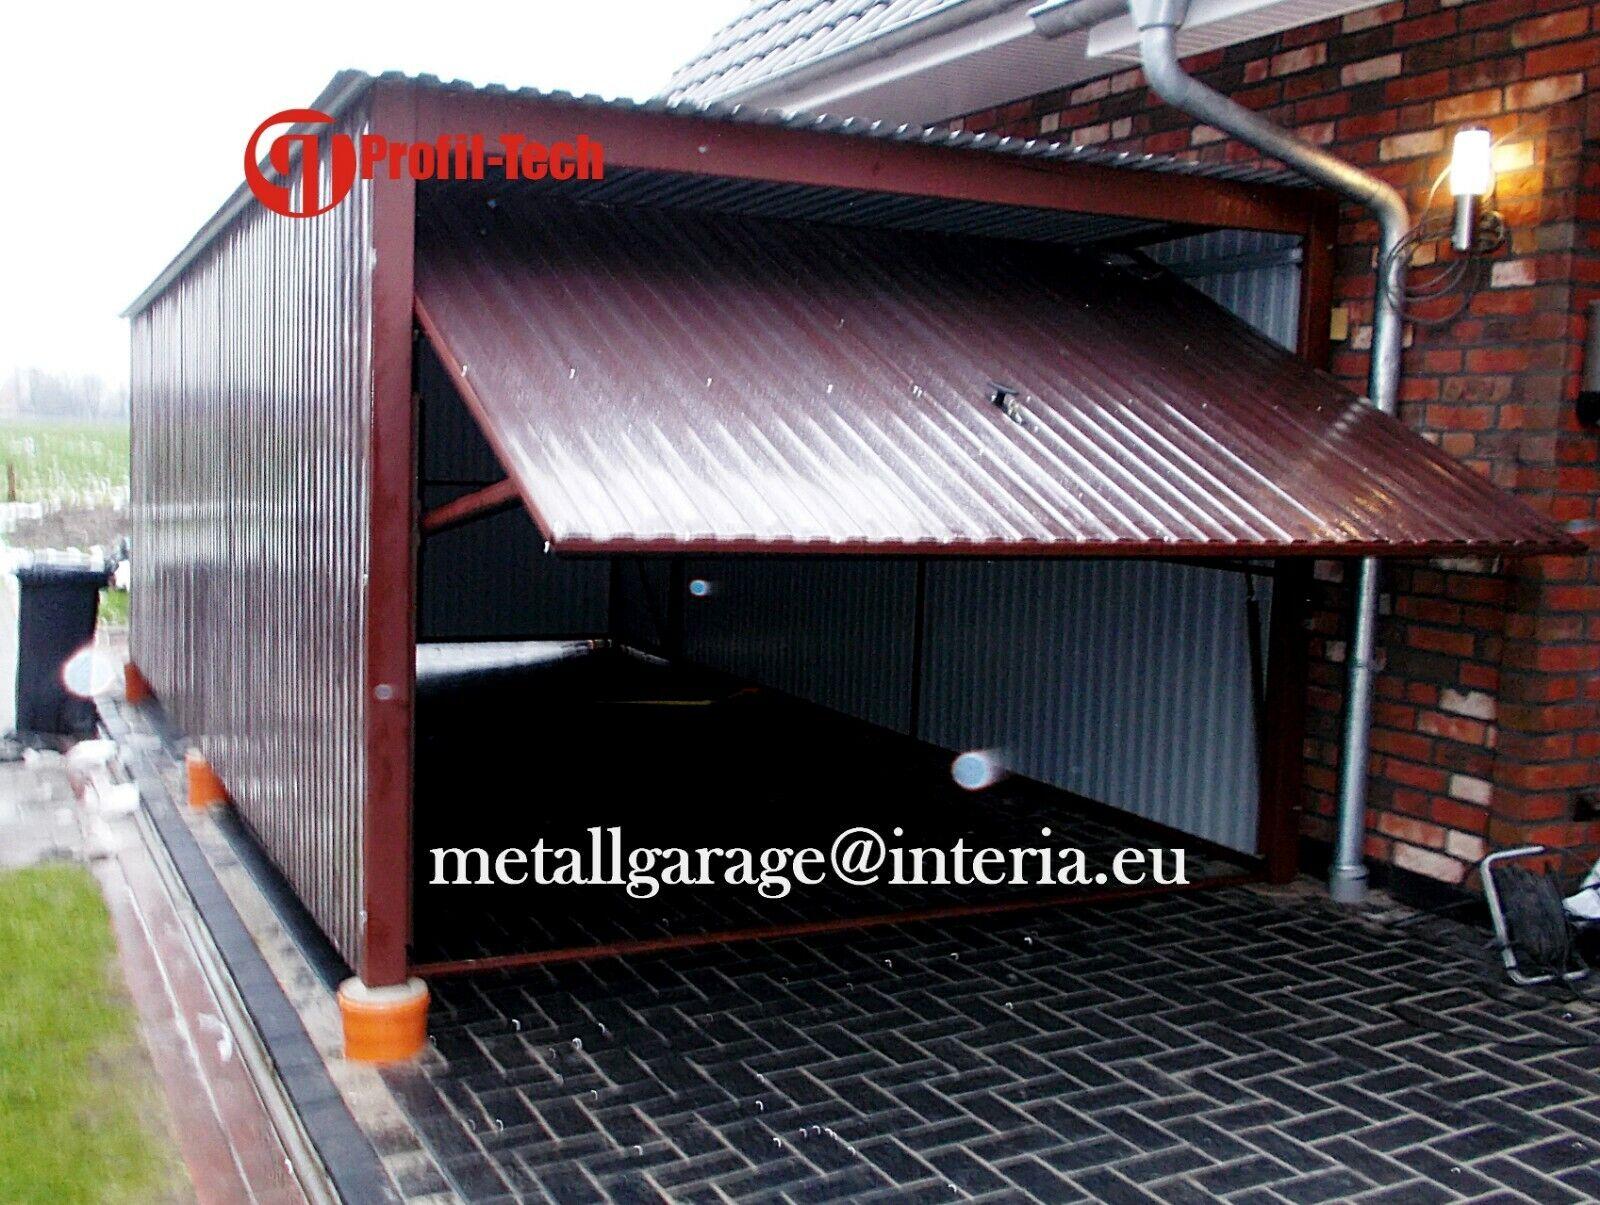 2,5X3,5 Blechgarage Container Metallgarage LAGERRAUM GERÄTESCHUPPEN garage